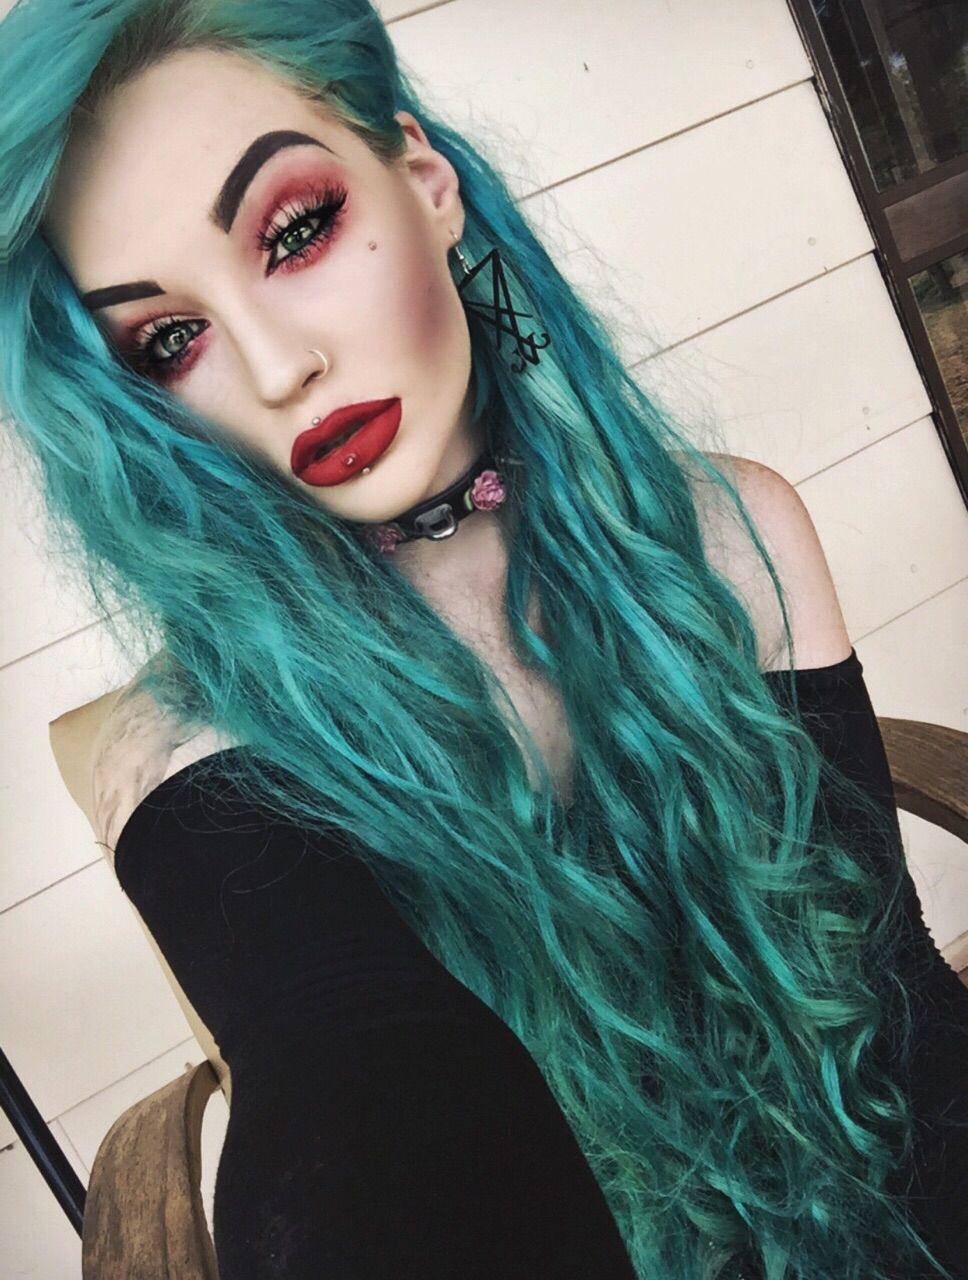 Pin by tess pringle on nails and makeup pinterest makeup hair